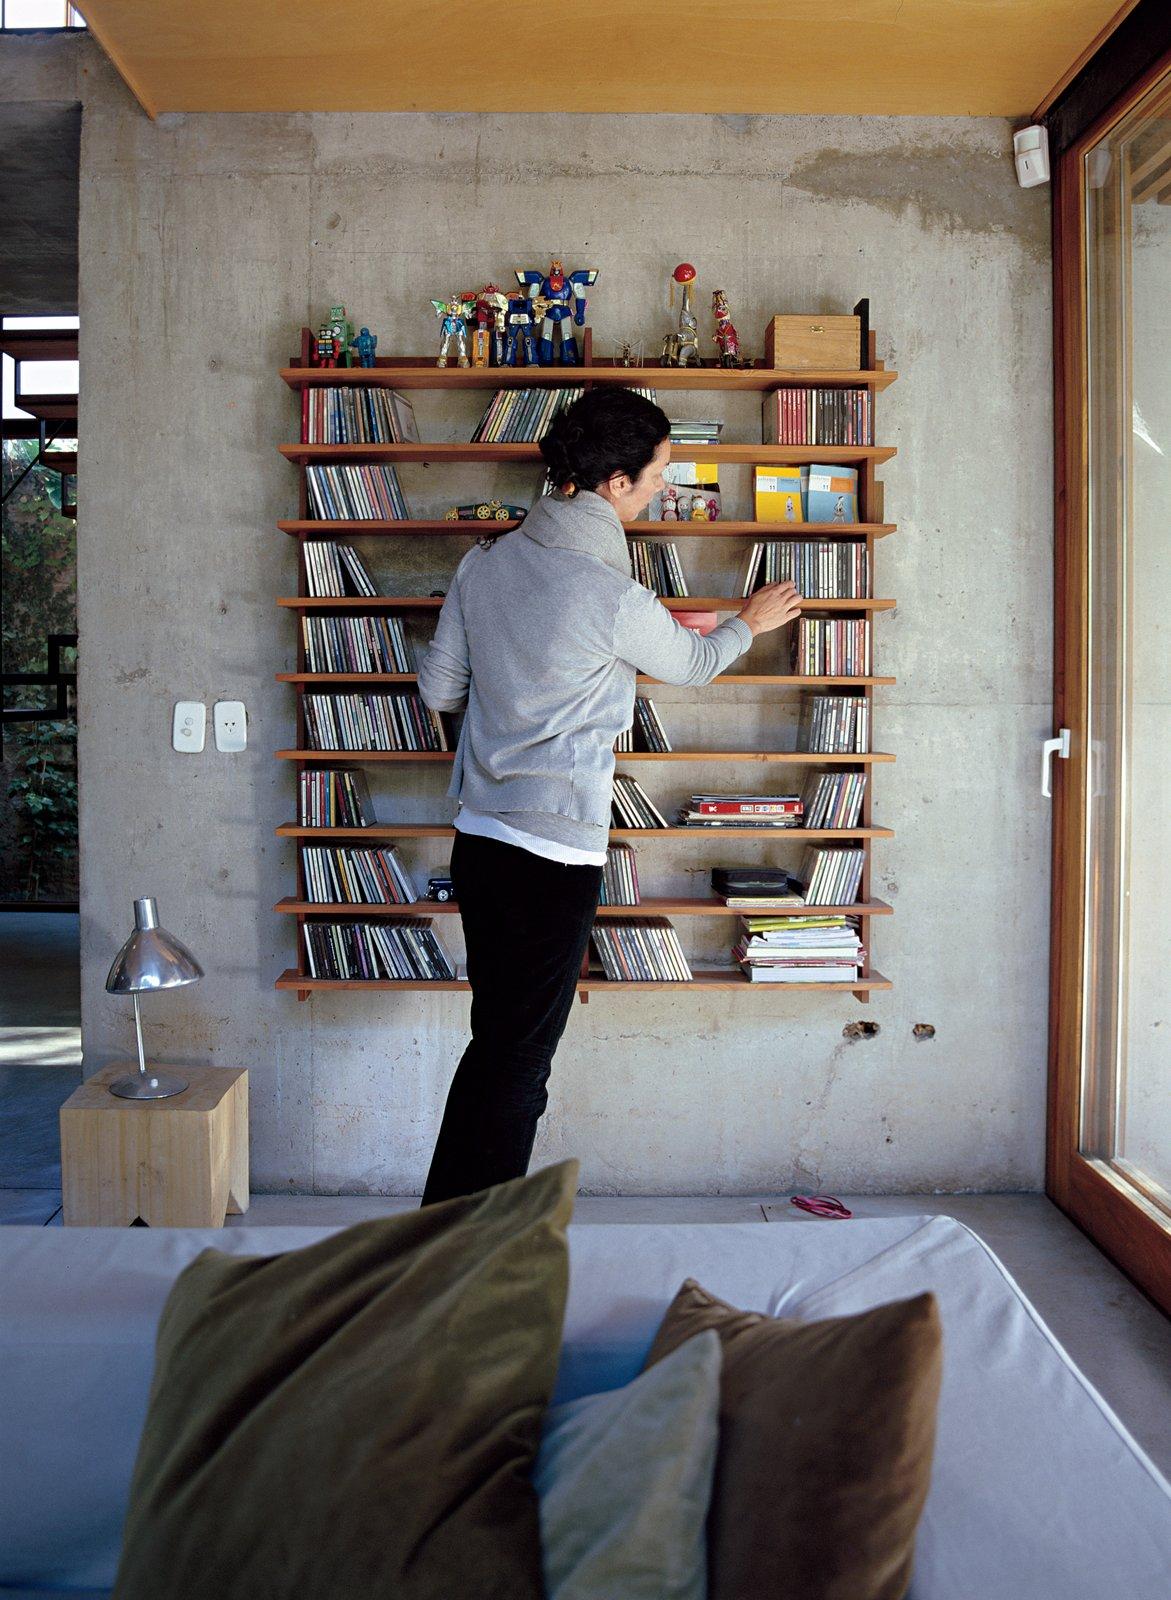 Hernaez organizes CDs on a modular lapacho wood shelf designed by Sticotti. Storage by Dwell